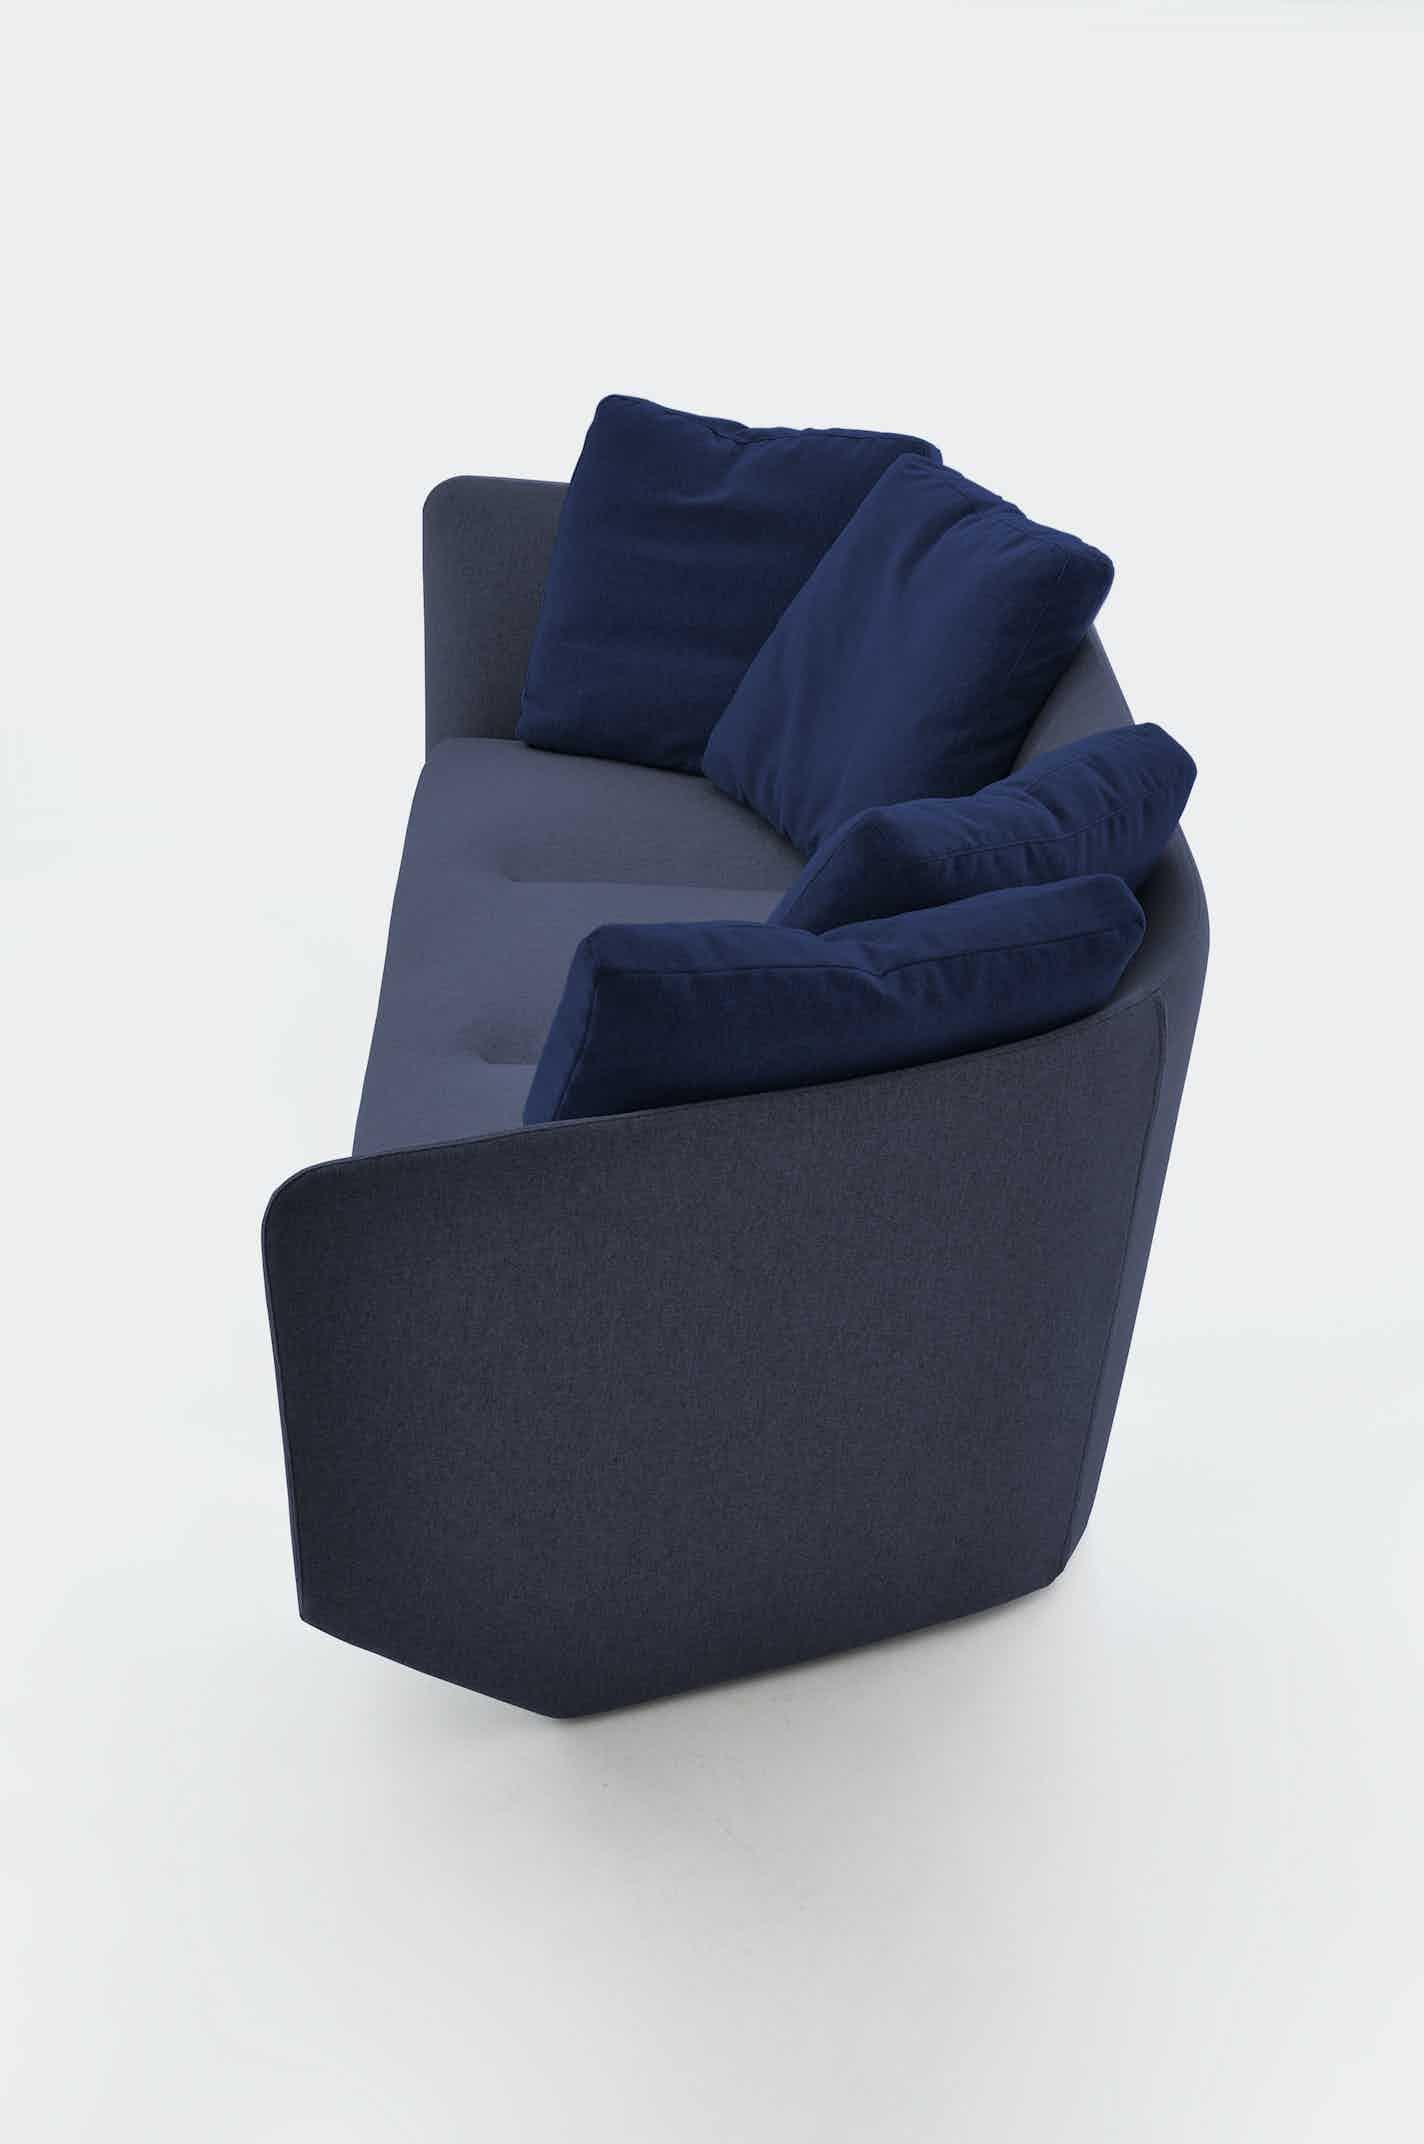 Bensen furniture aura sofa blue side haute living